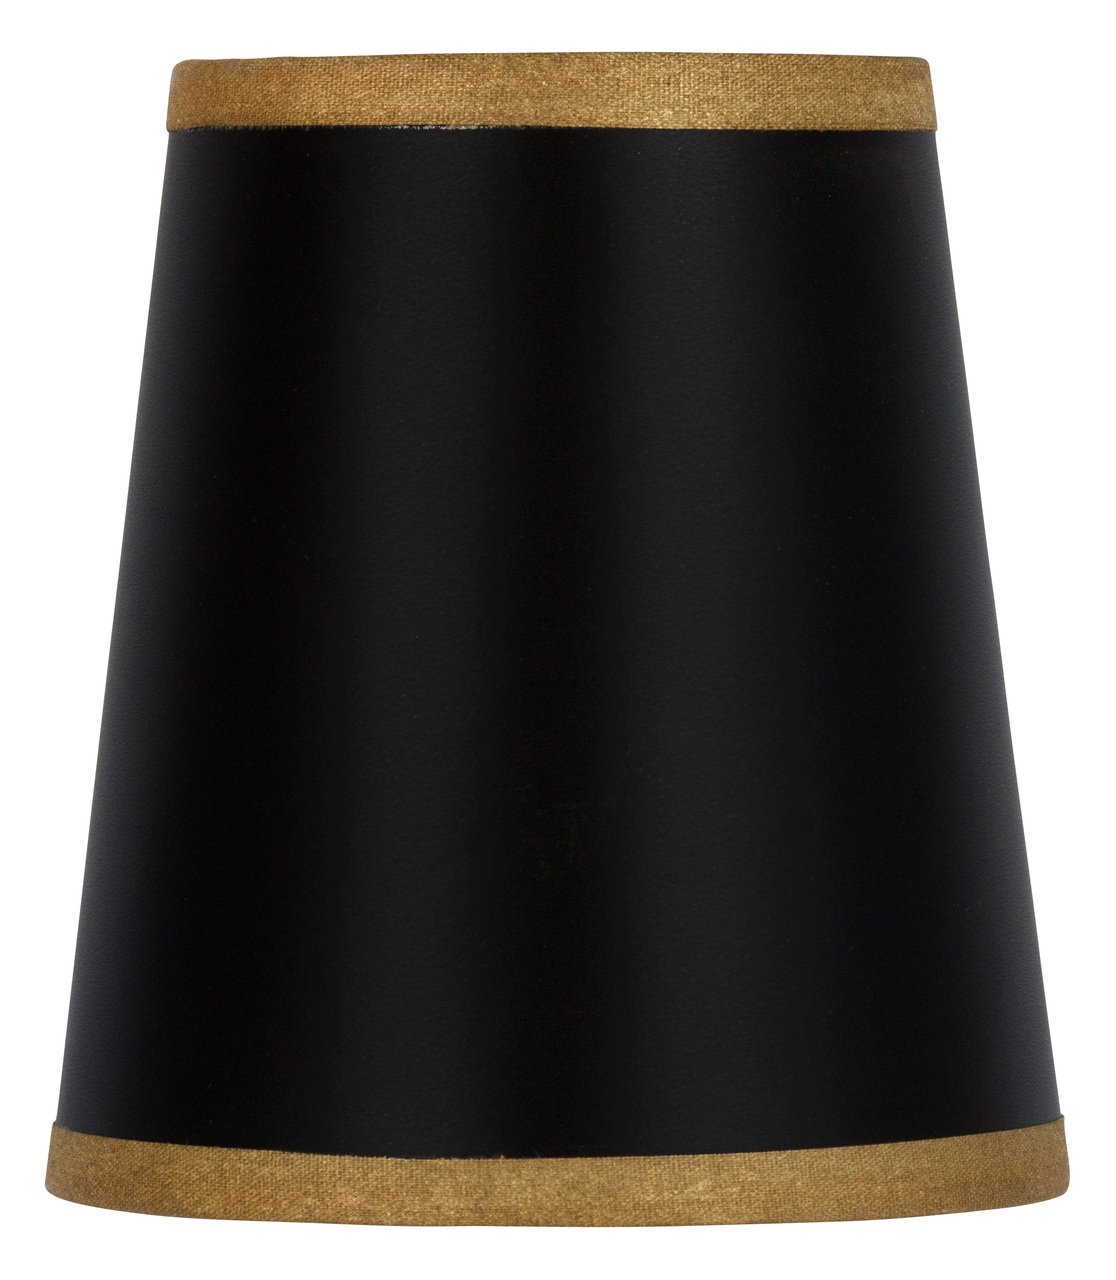 Upgradelights Black 4 Inch Chandelier Shade Wall Sconce Barrel Drum Gold Trim 3x4x4.5